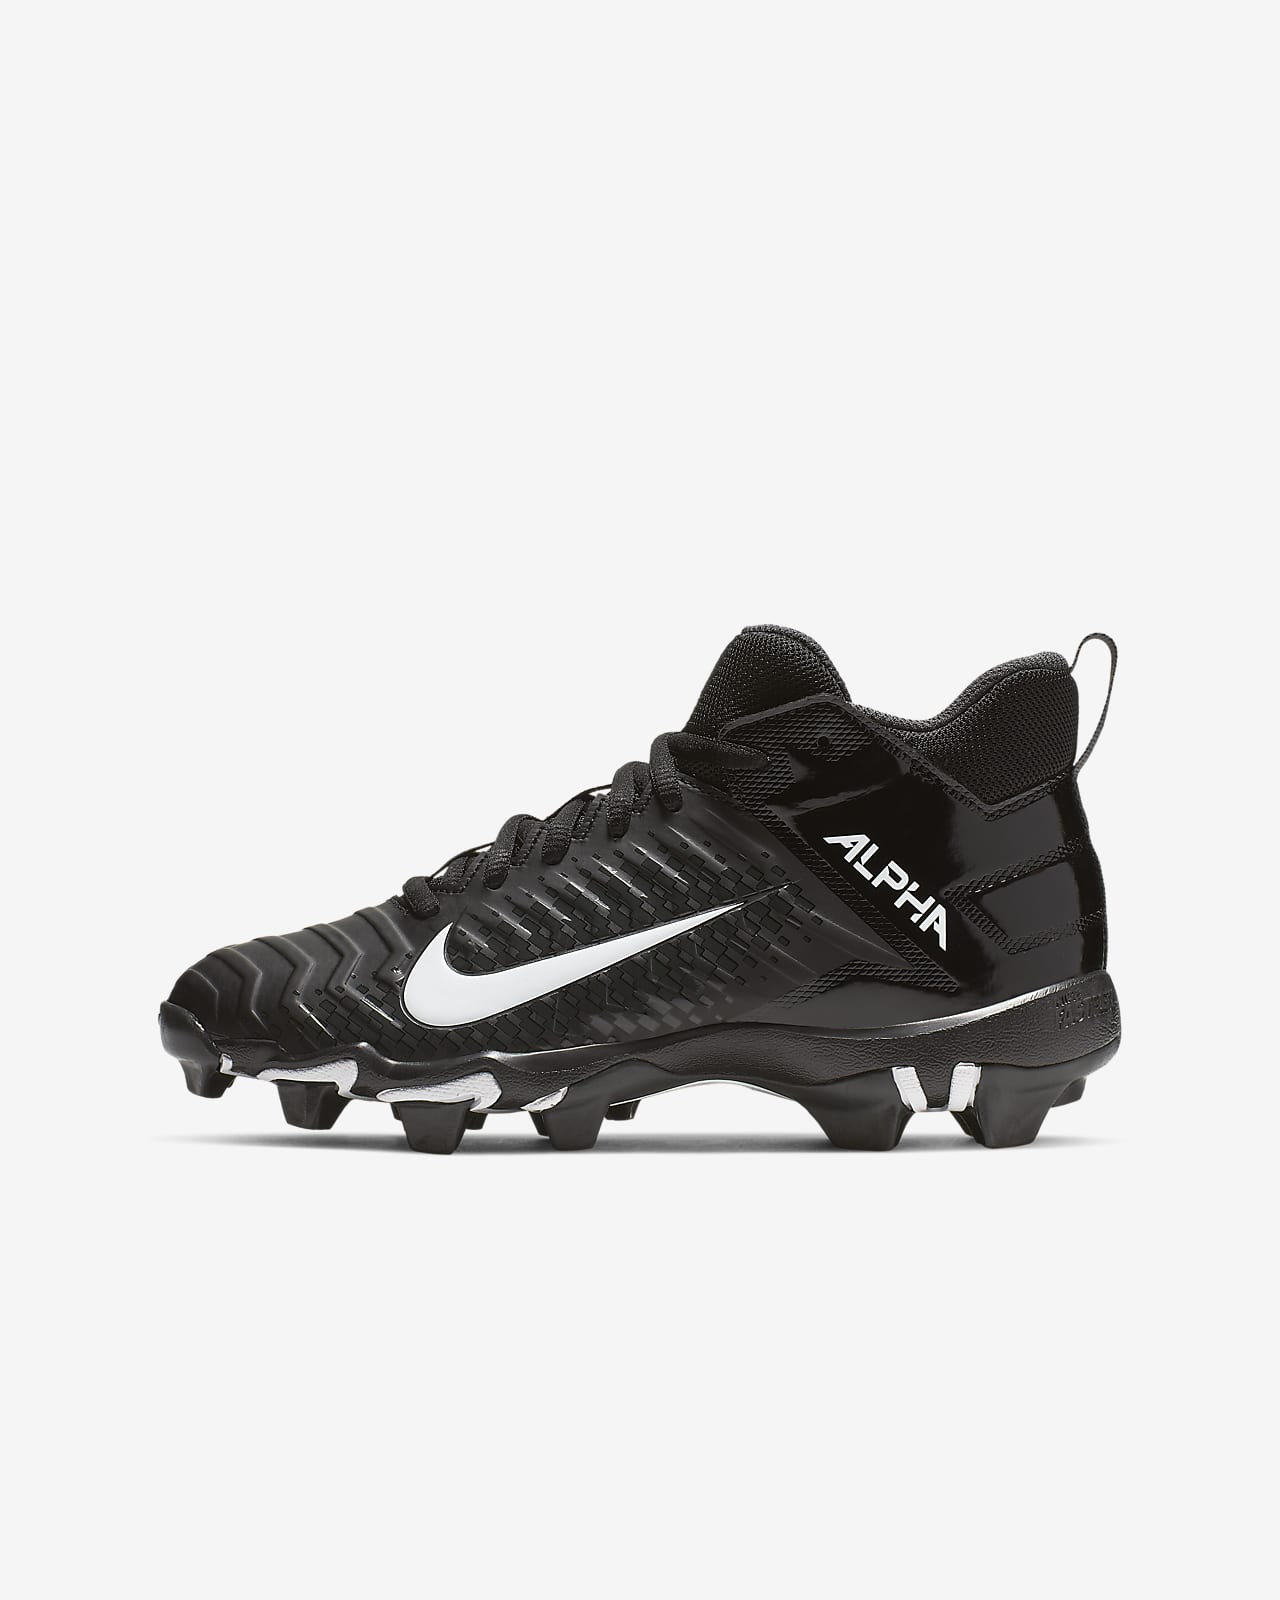 kids football cleats size 1